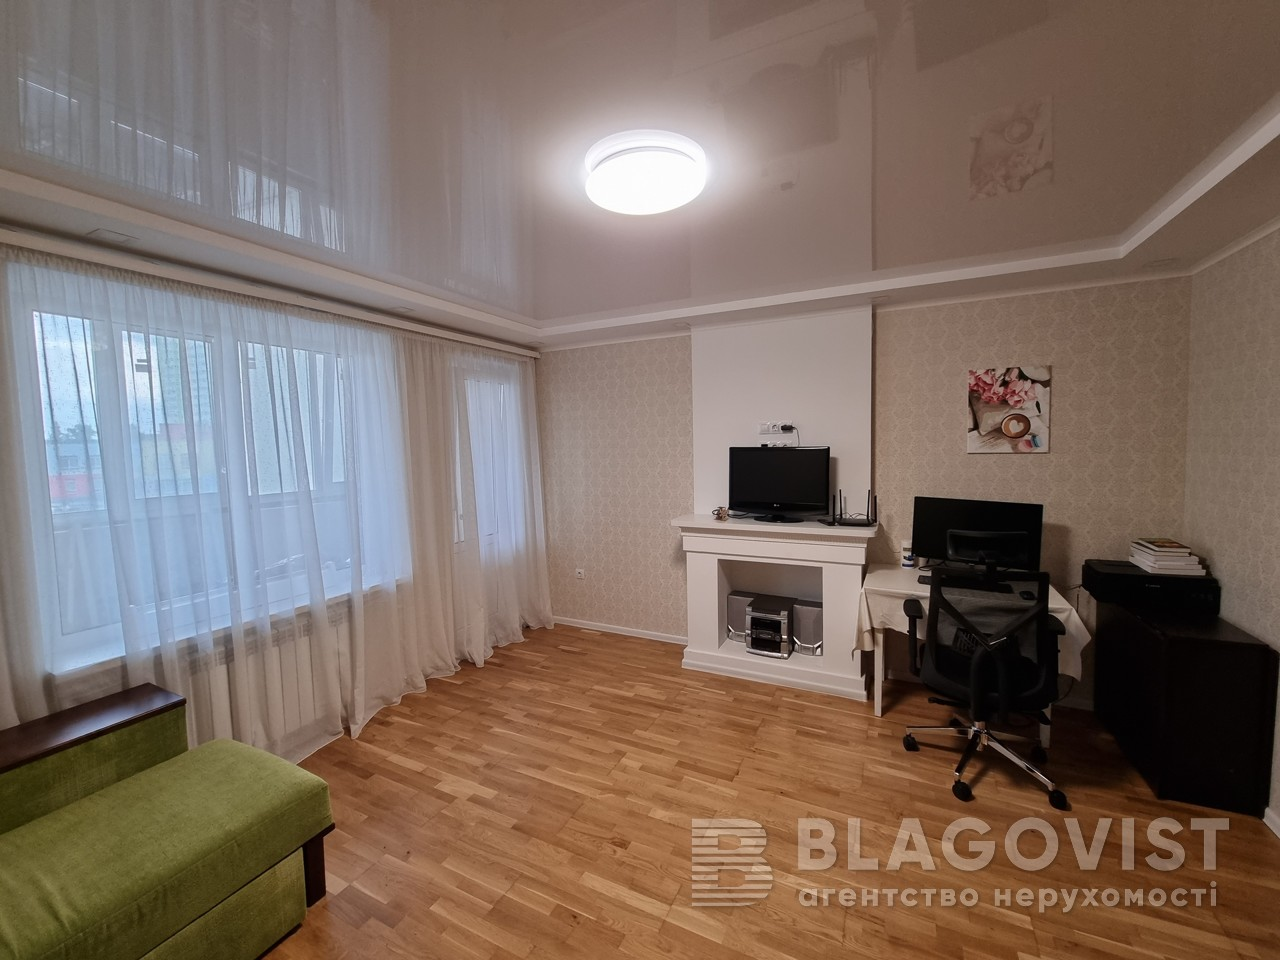 Квартира H-50634, Доковская, 10 корпус 6, Коцюбинское - Фото 4